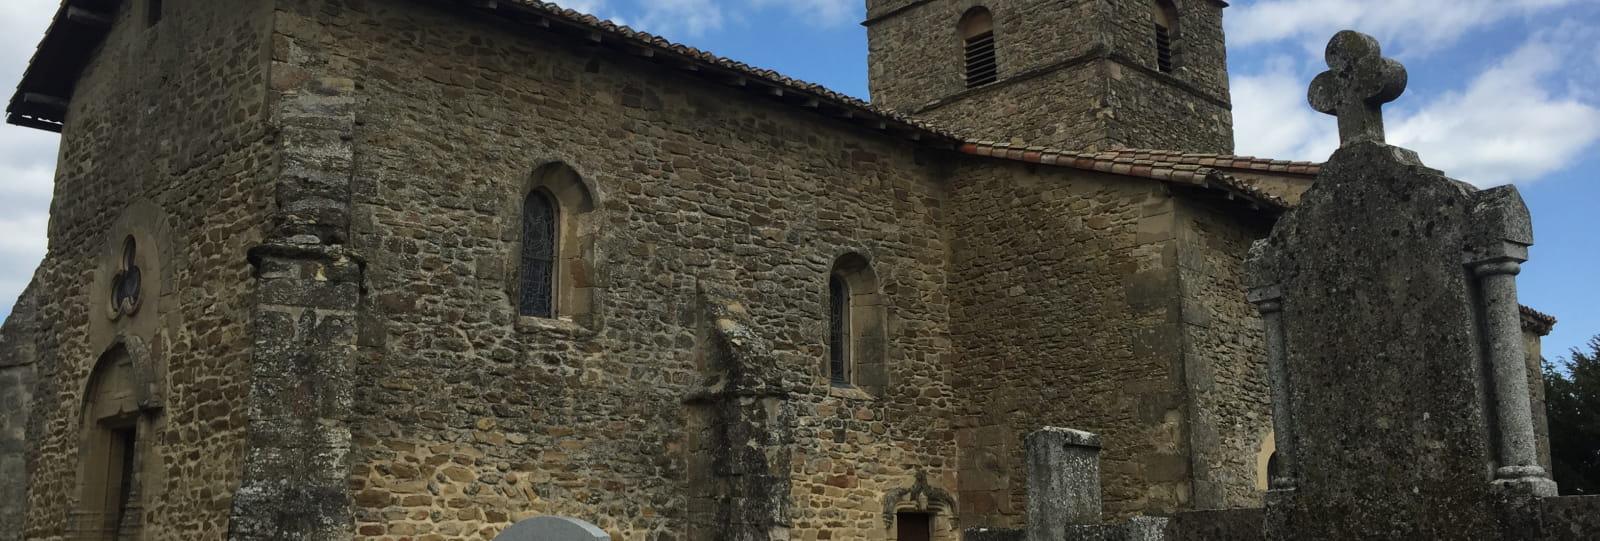 Eglise de Bathernay